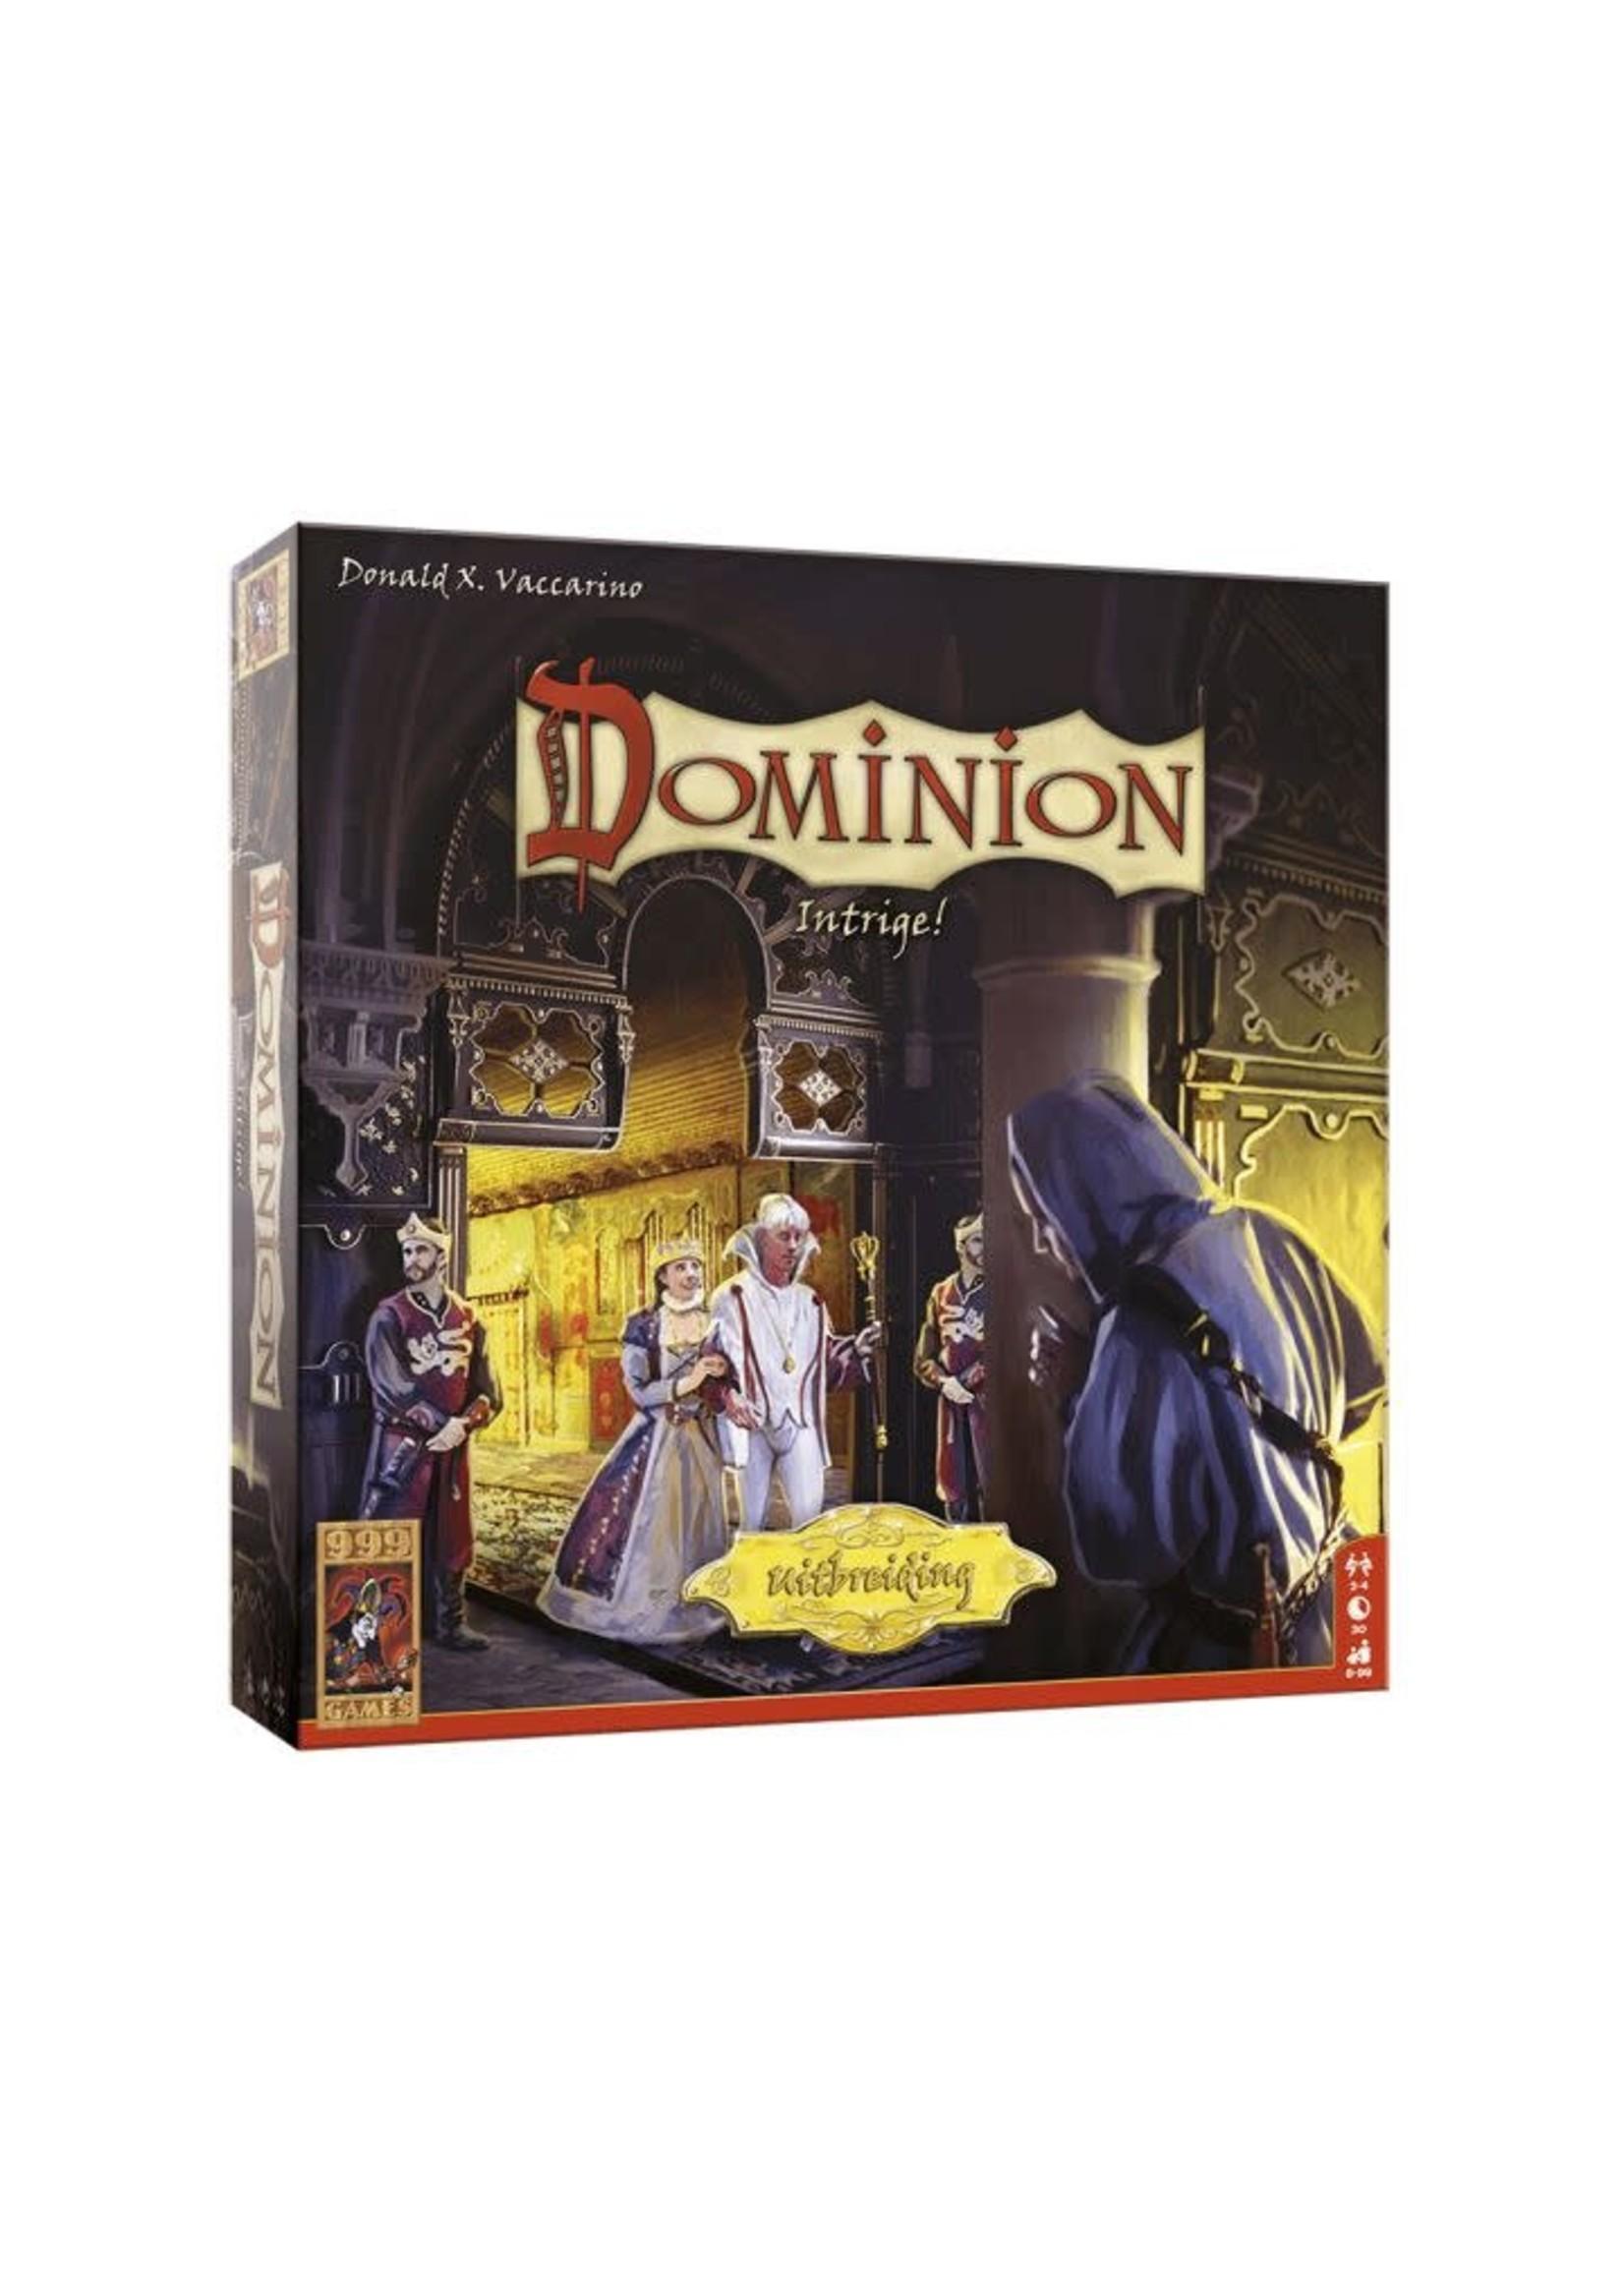 Dominion: Intrige!